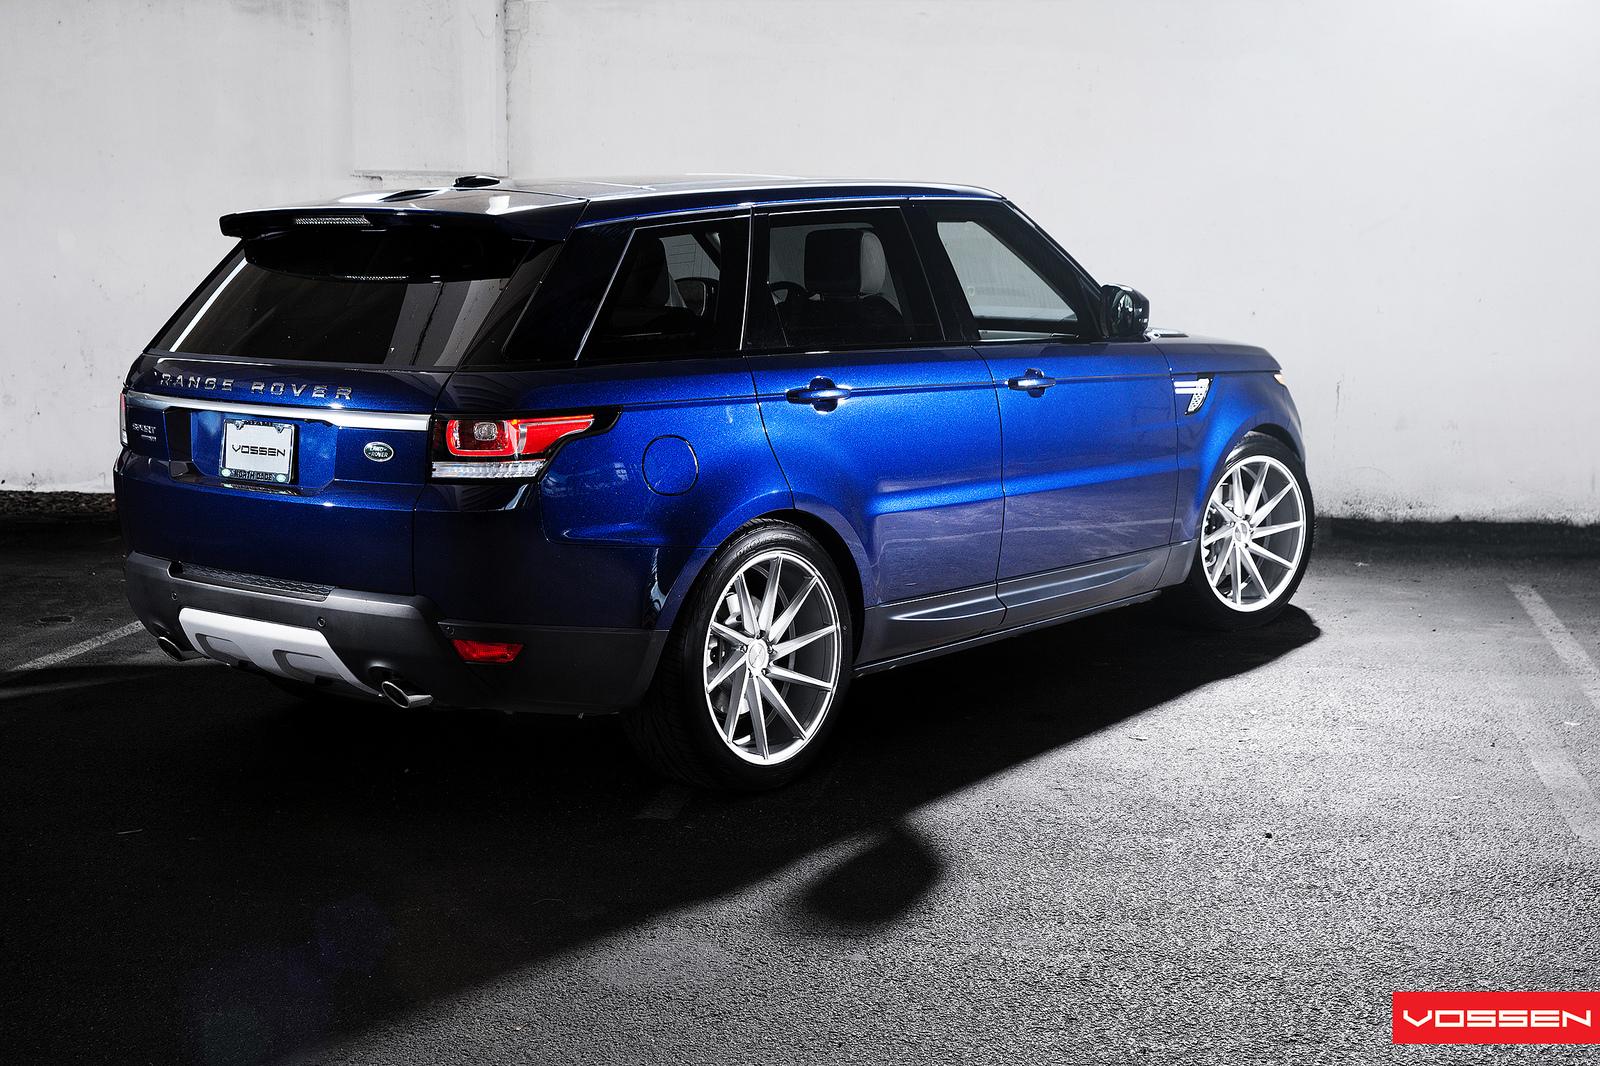 2014 range rover sport gets 22 inch vossen cvt wheels video autoevolution. Black Bedroom Furniture Sets. Home Design Ideas